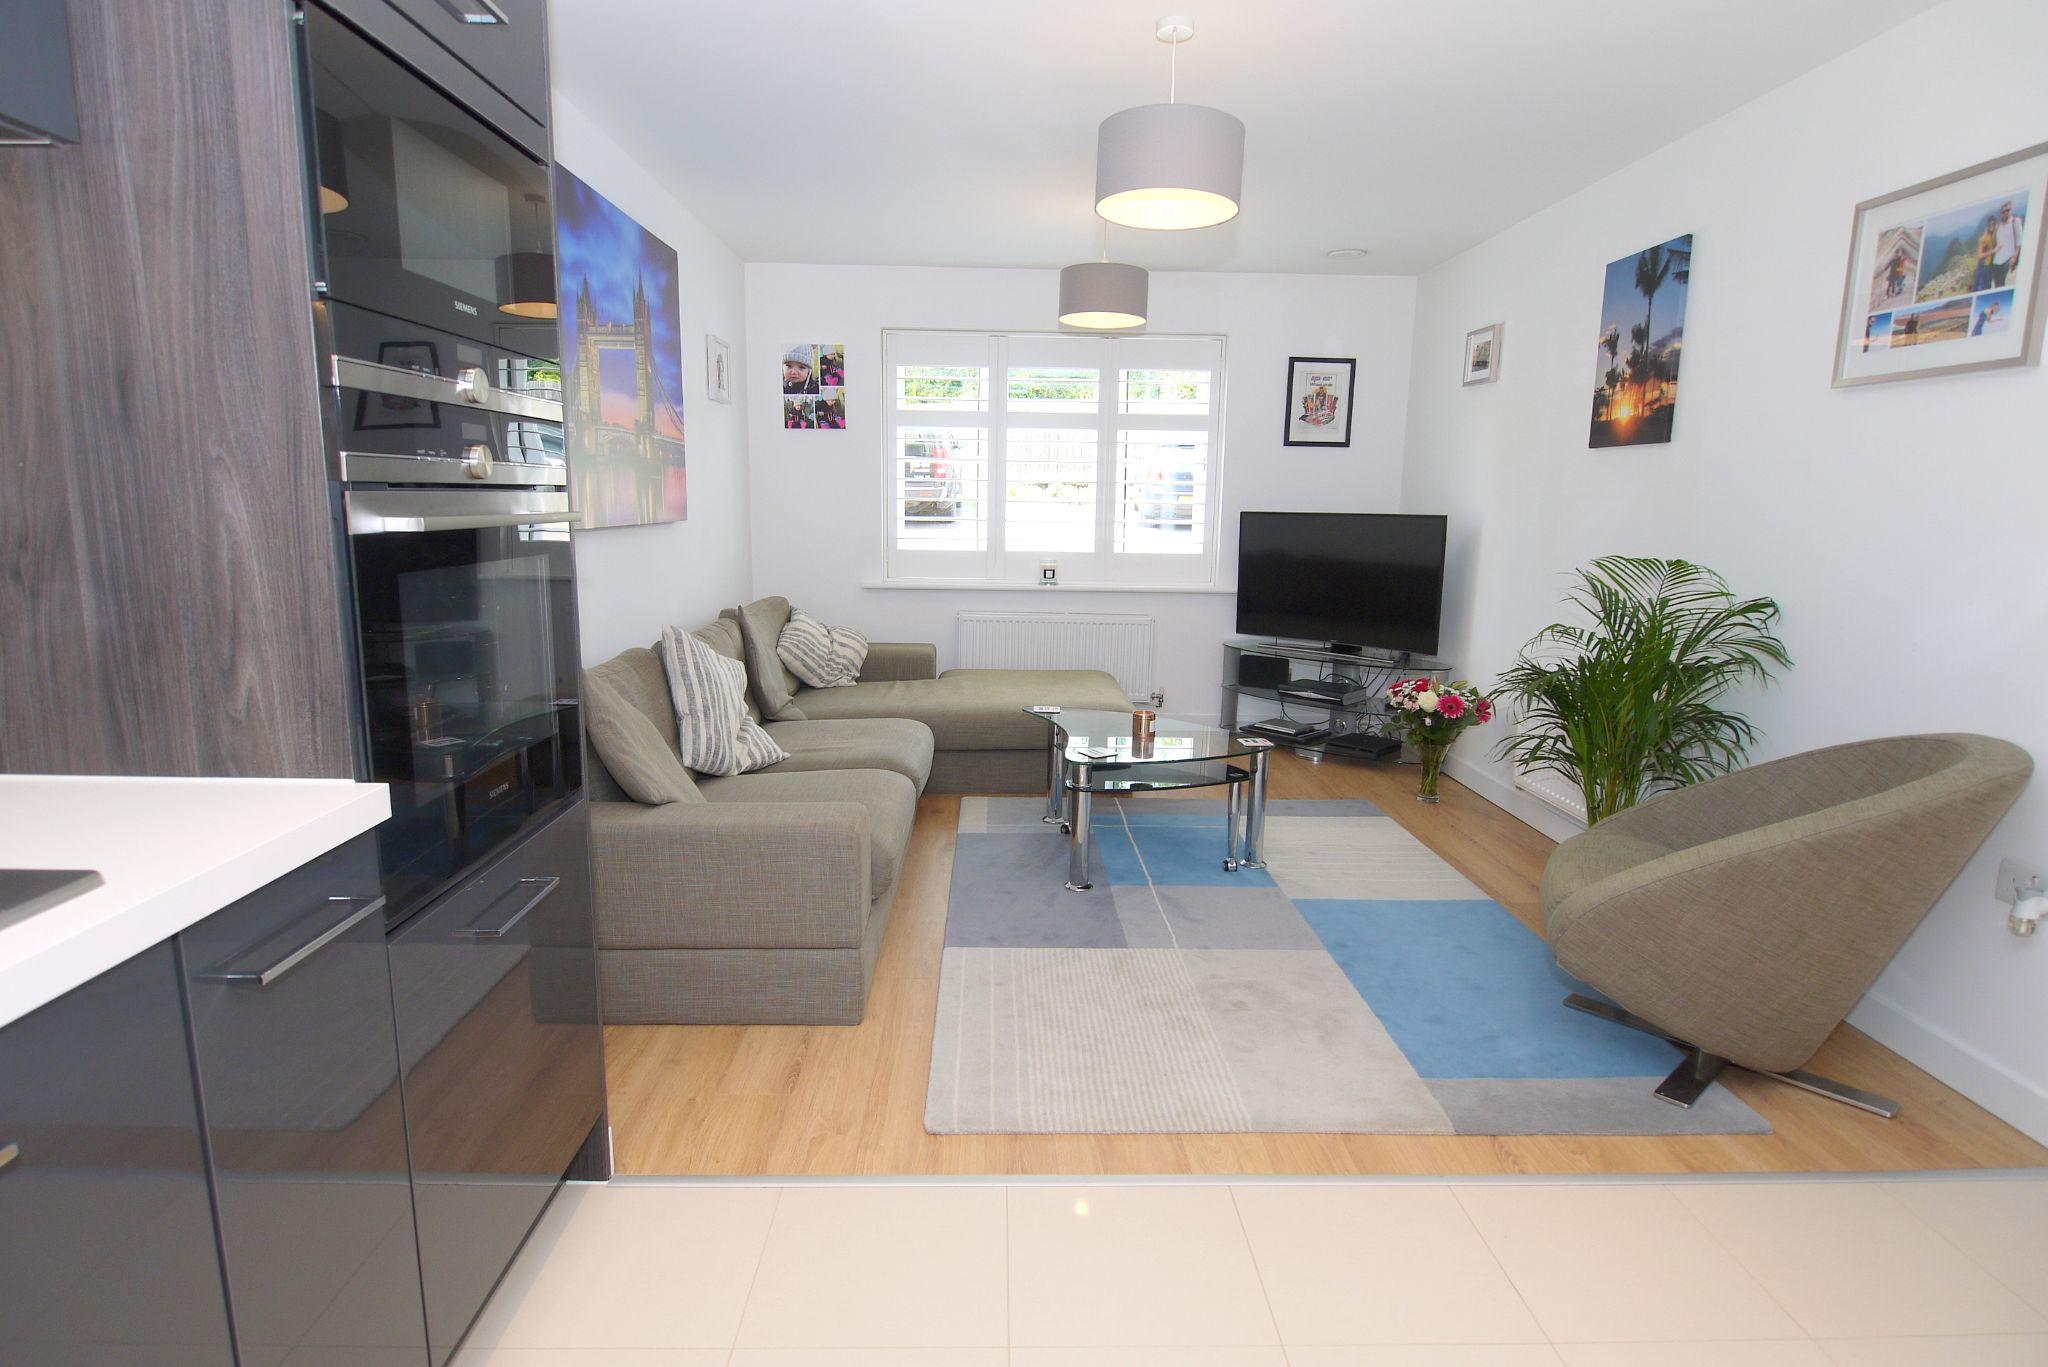 1 bedroom apartment flat/apartment For Sale in Sevenoaks - Photograph 3